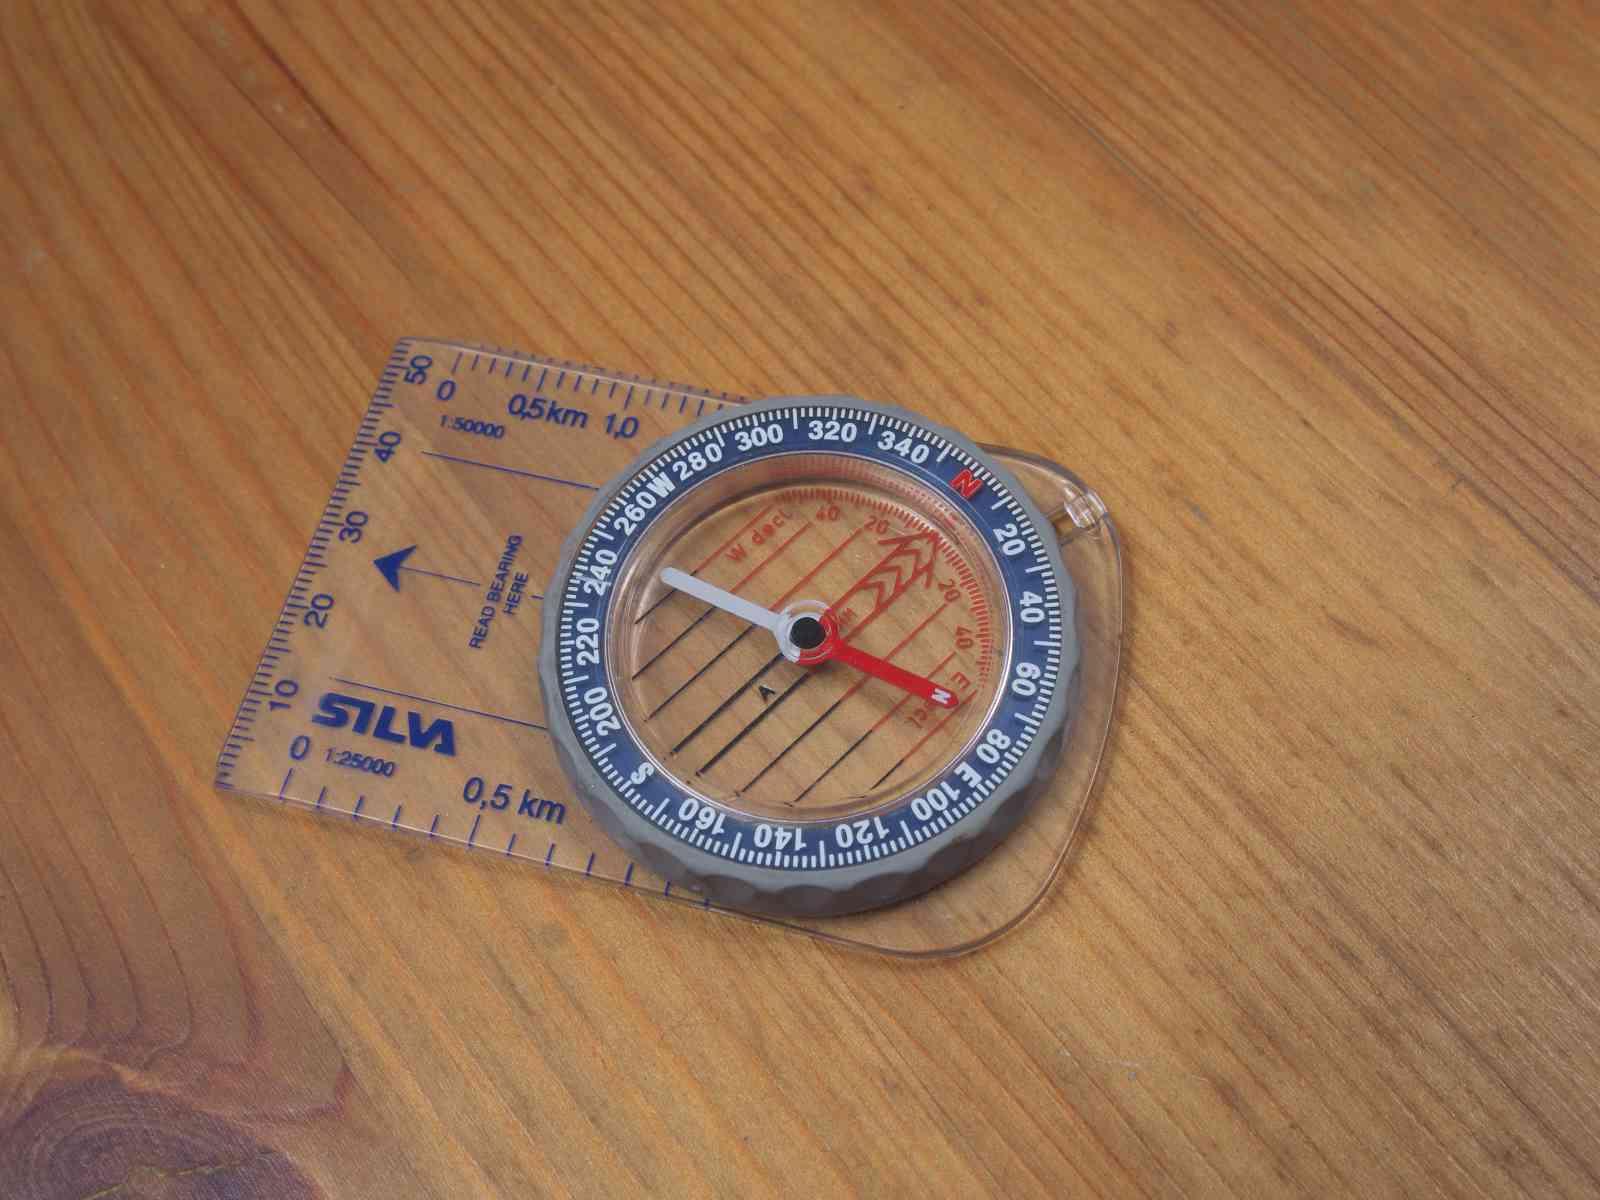 Silva-Kompass